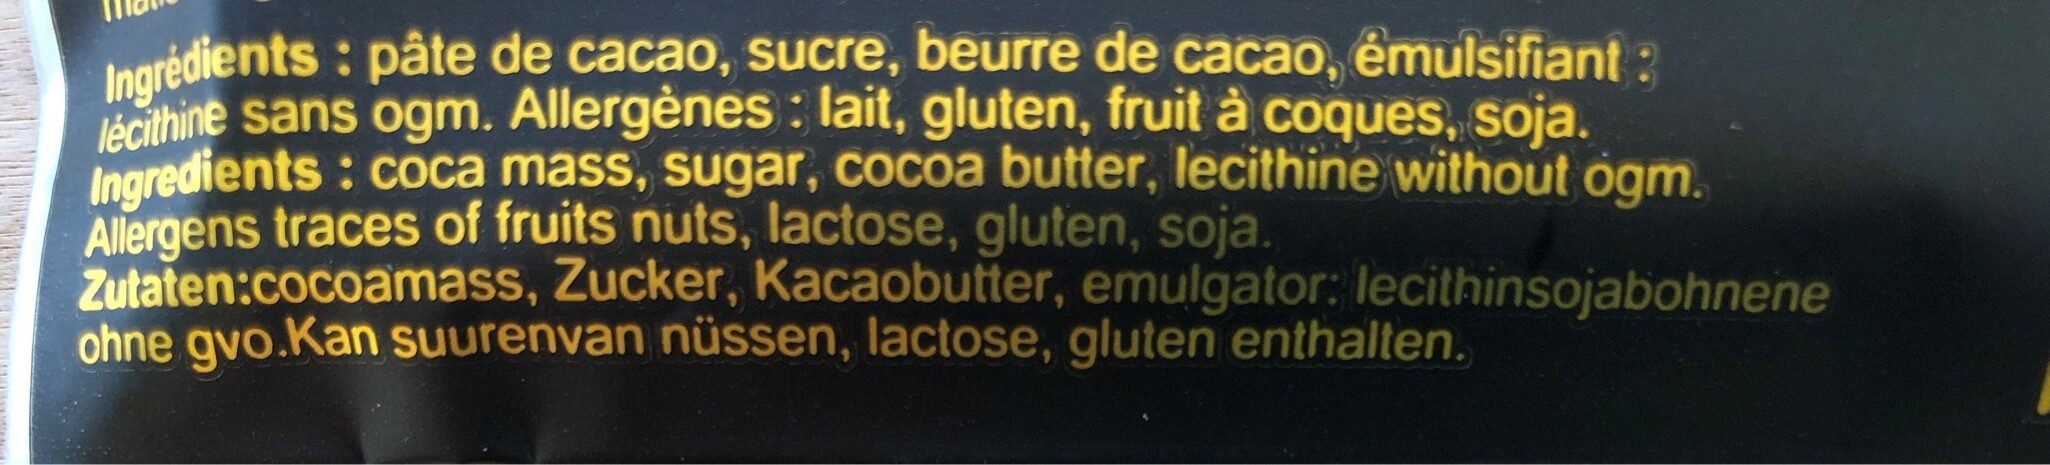 Chocolat 75% - Ingrédients